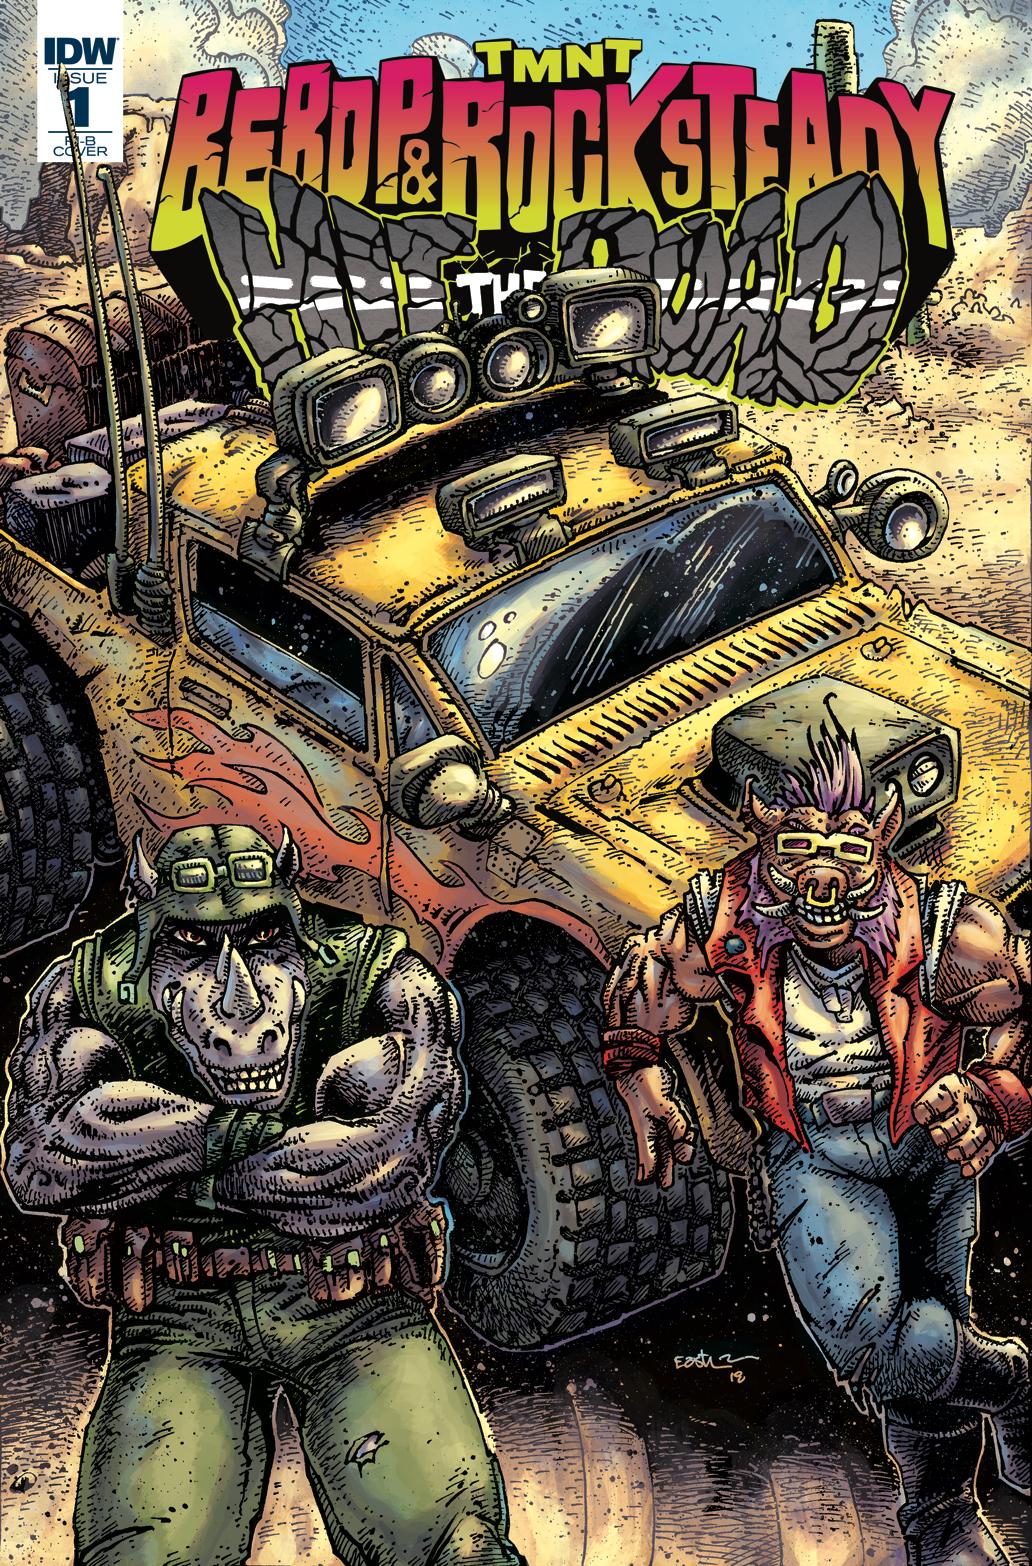 TMNT BEBOP ROCKSTEADY HIT THE ROAD #1